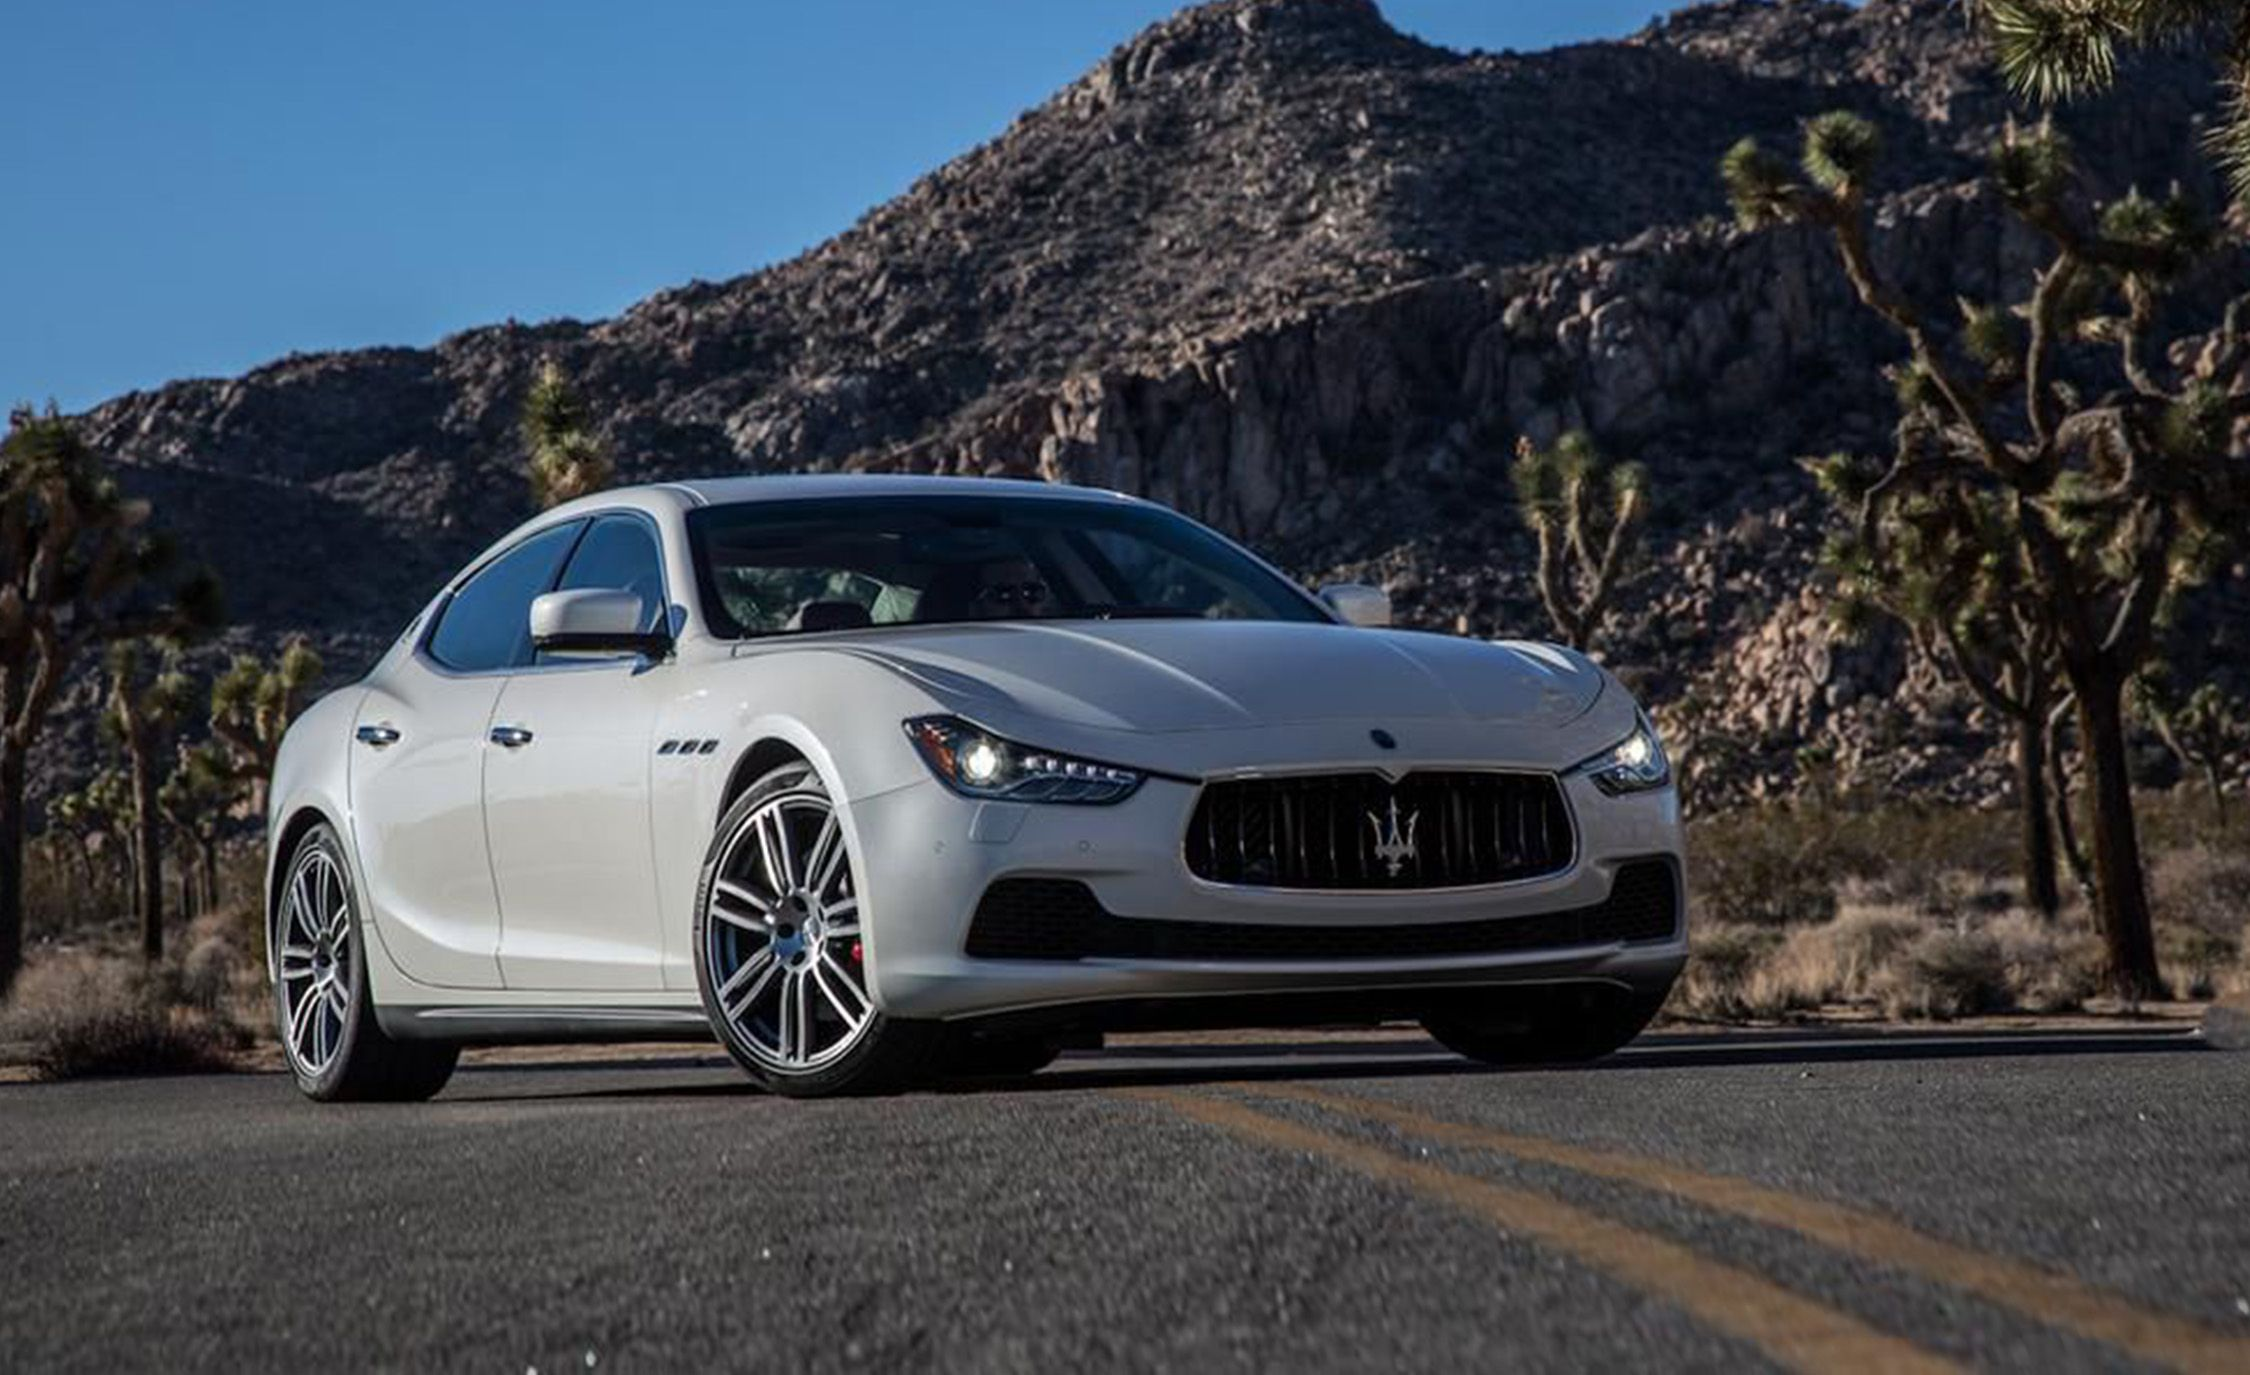 2014 Maserati Ghibli S Q4 Full Test Review Car And Driver